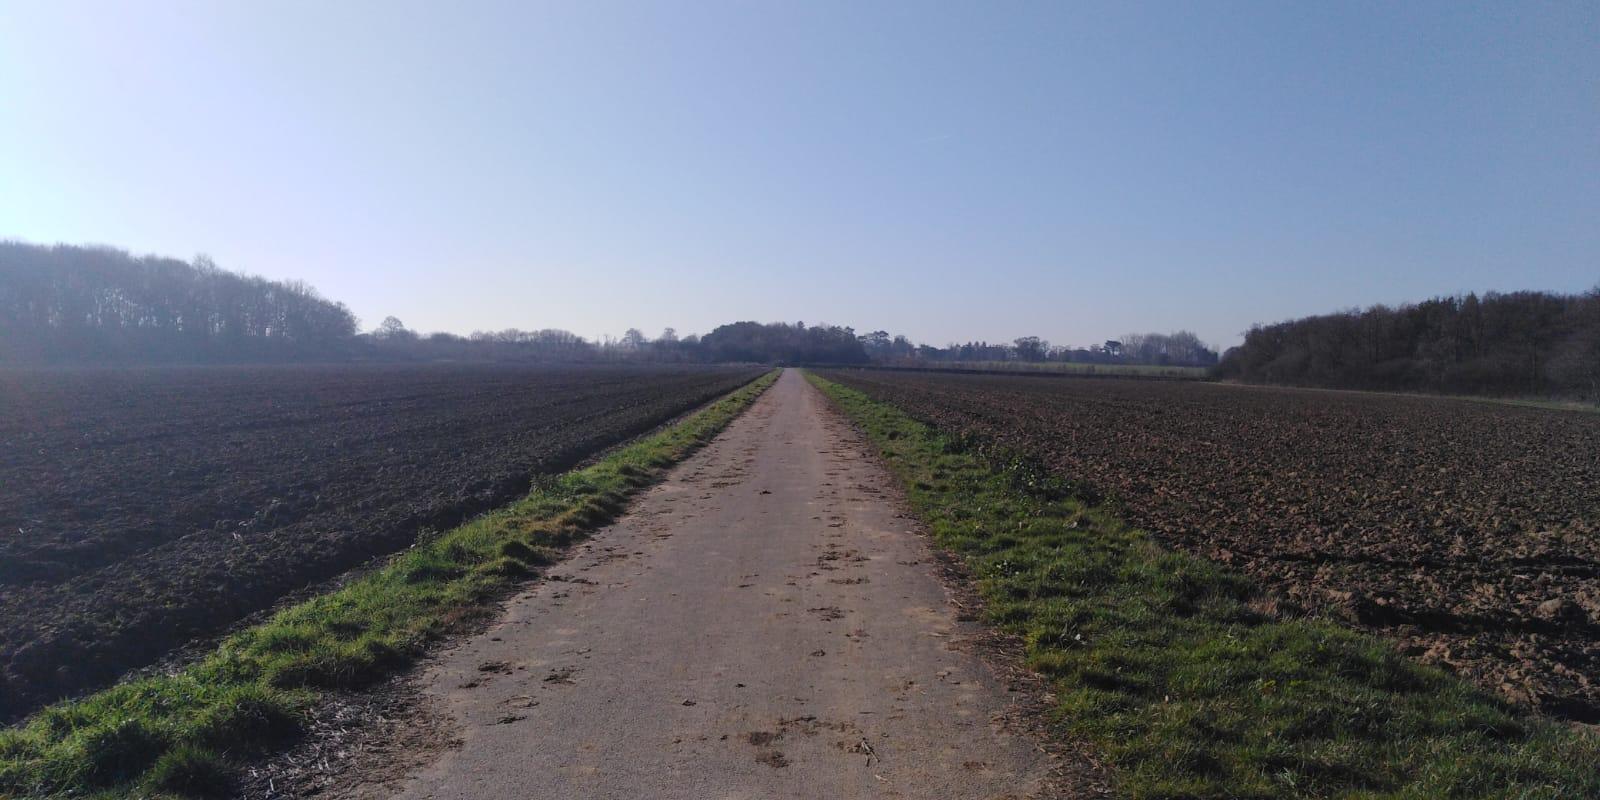 Skellingthorpe to Doddington on the sustrans